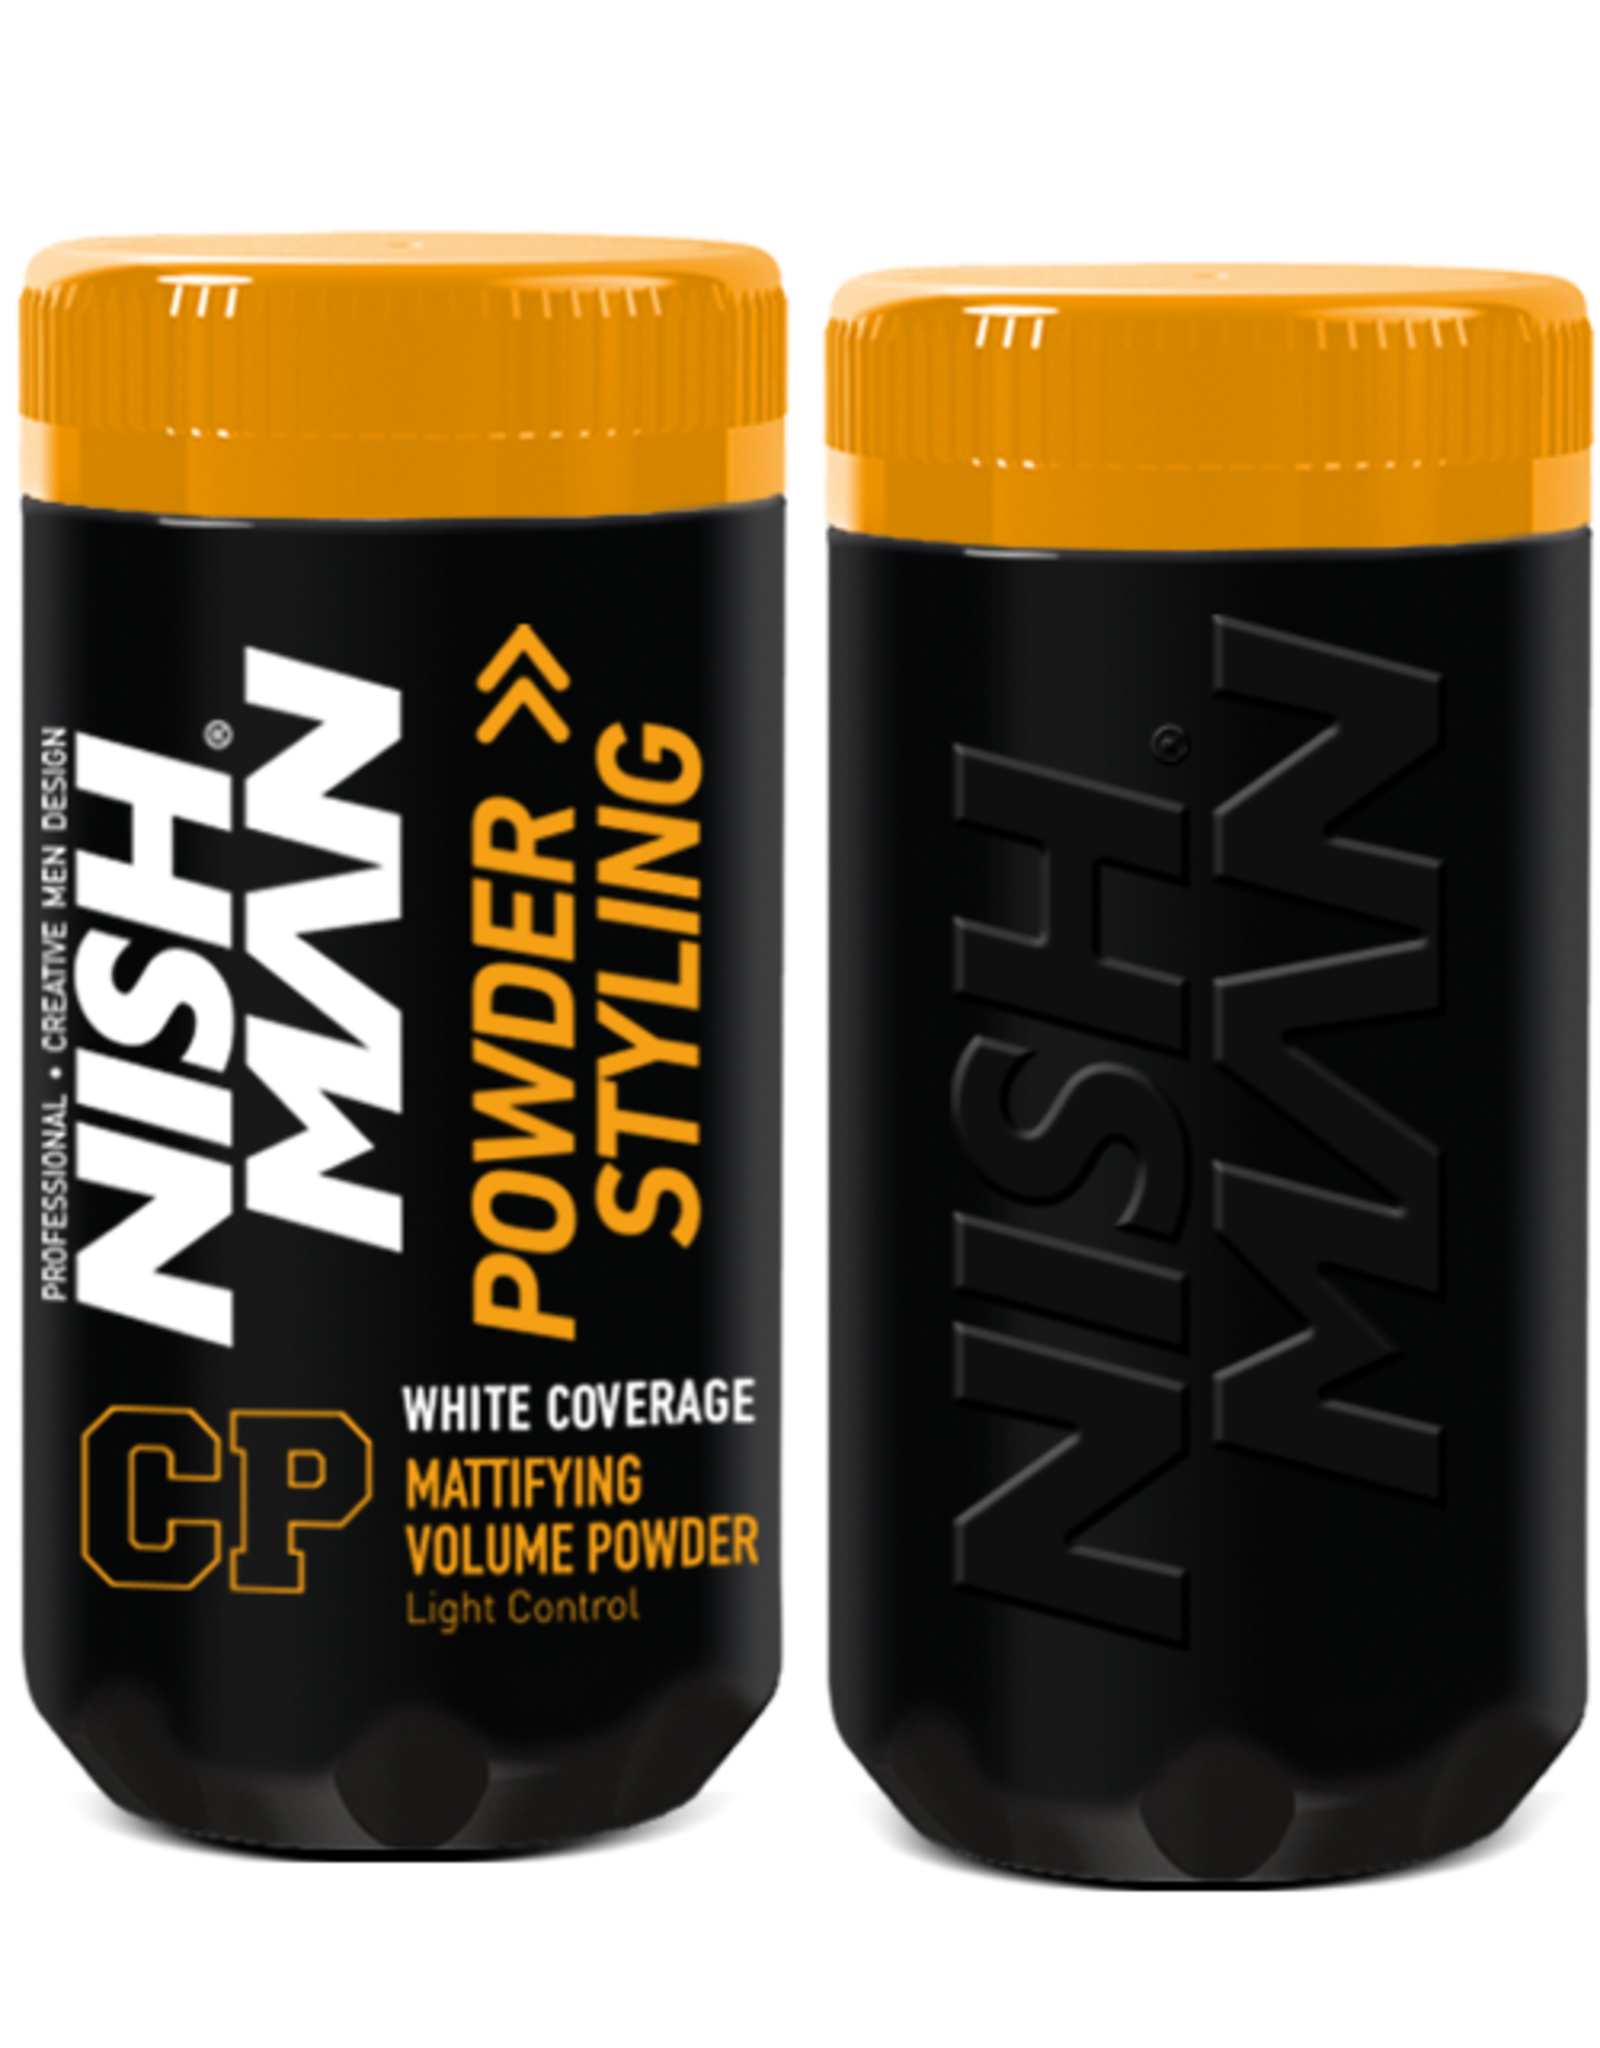 Nishman Color Powder Styling